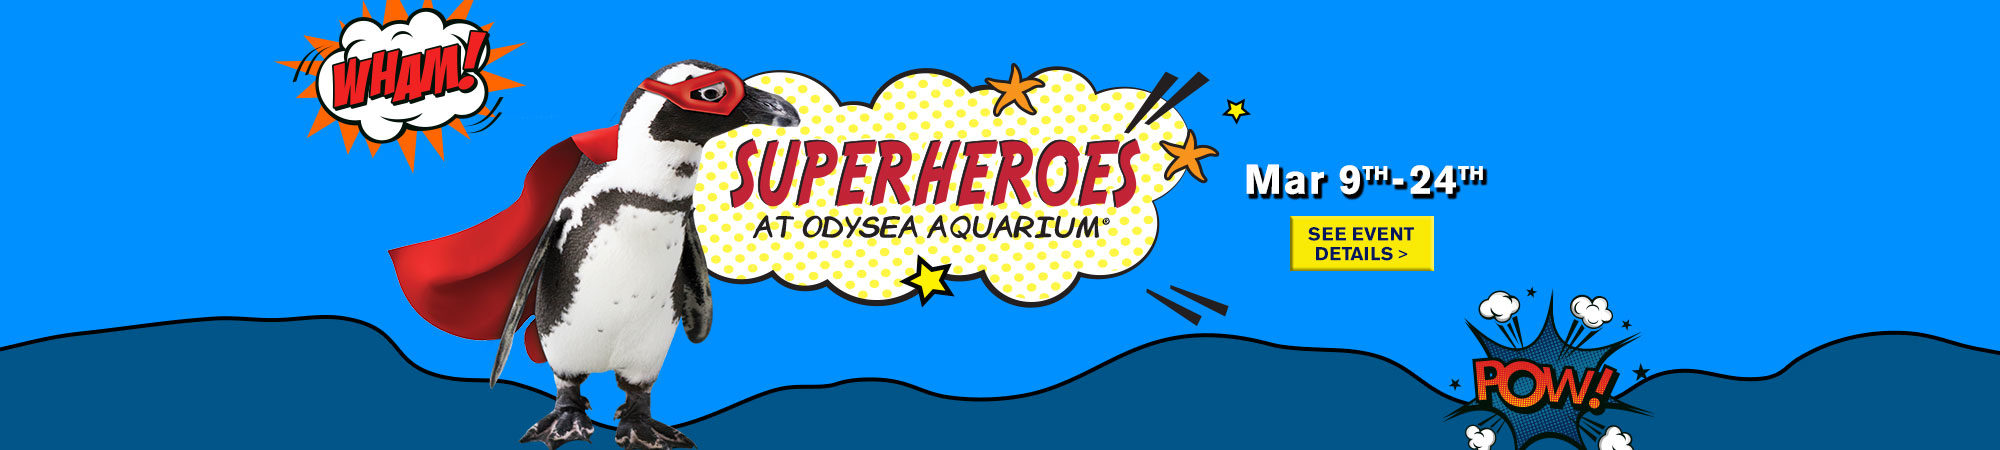 OA-Superheroes-HomepageSlider